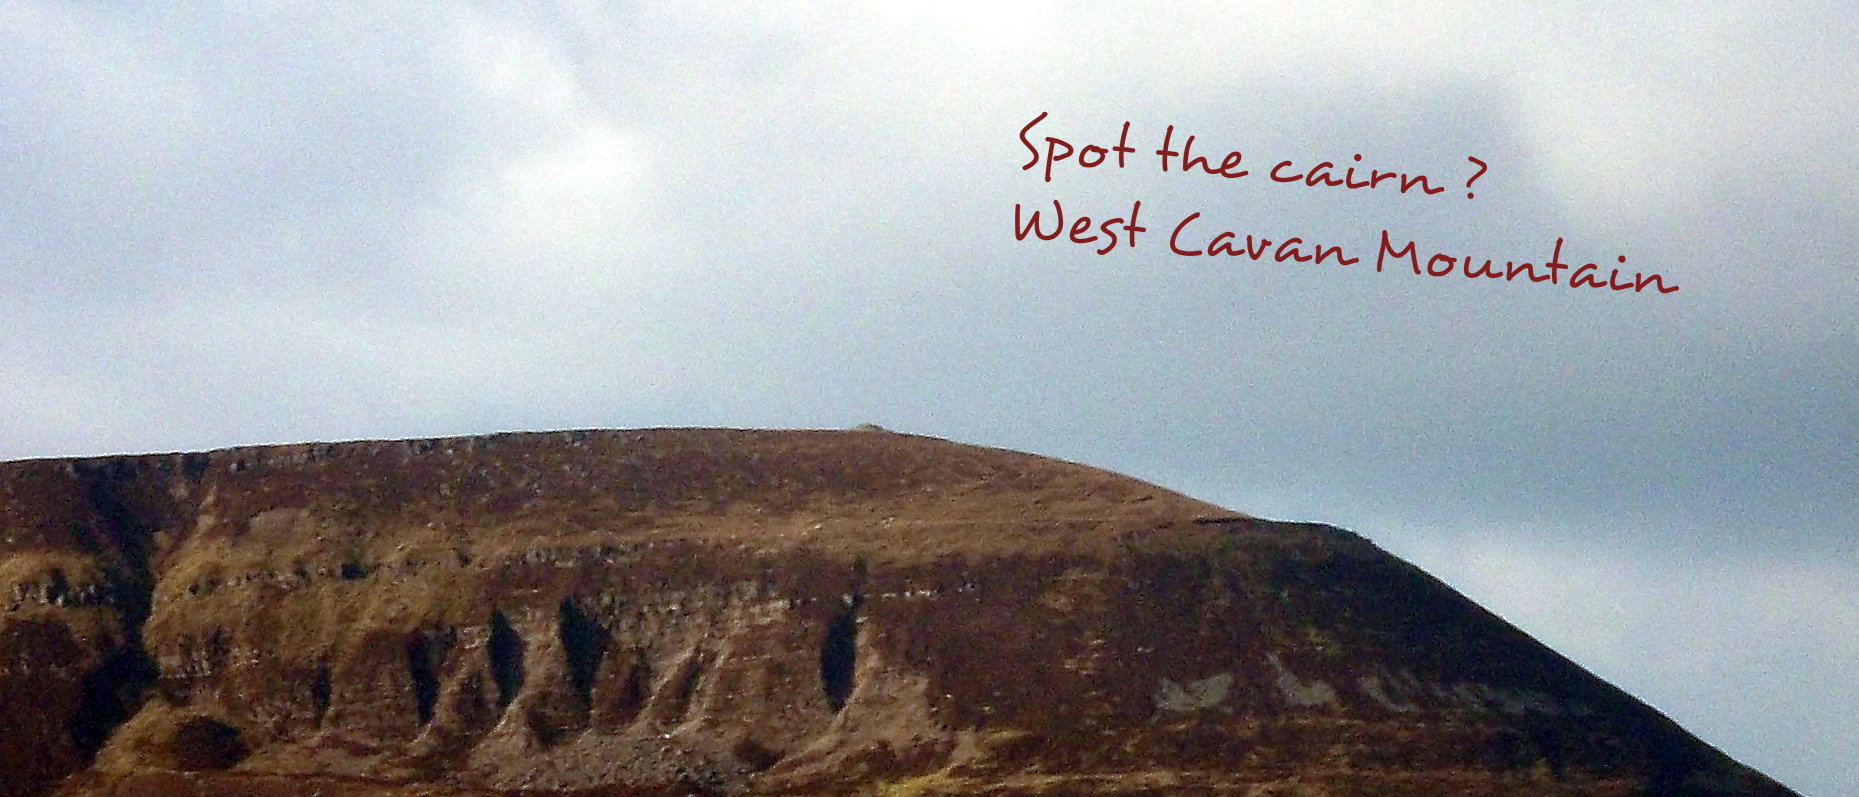 Cuilcagh cairn